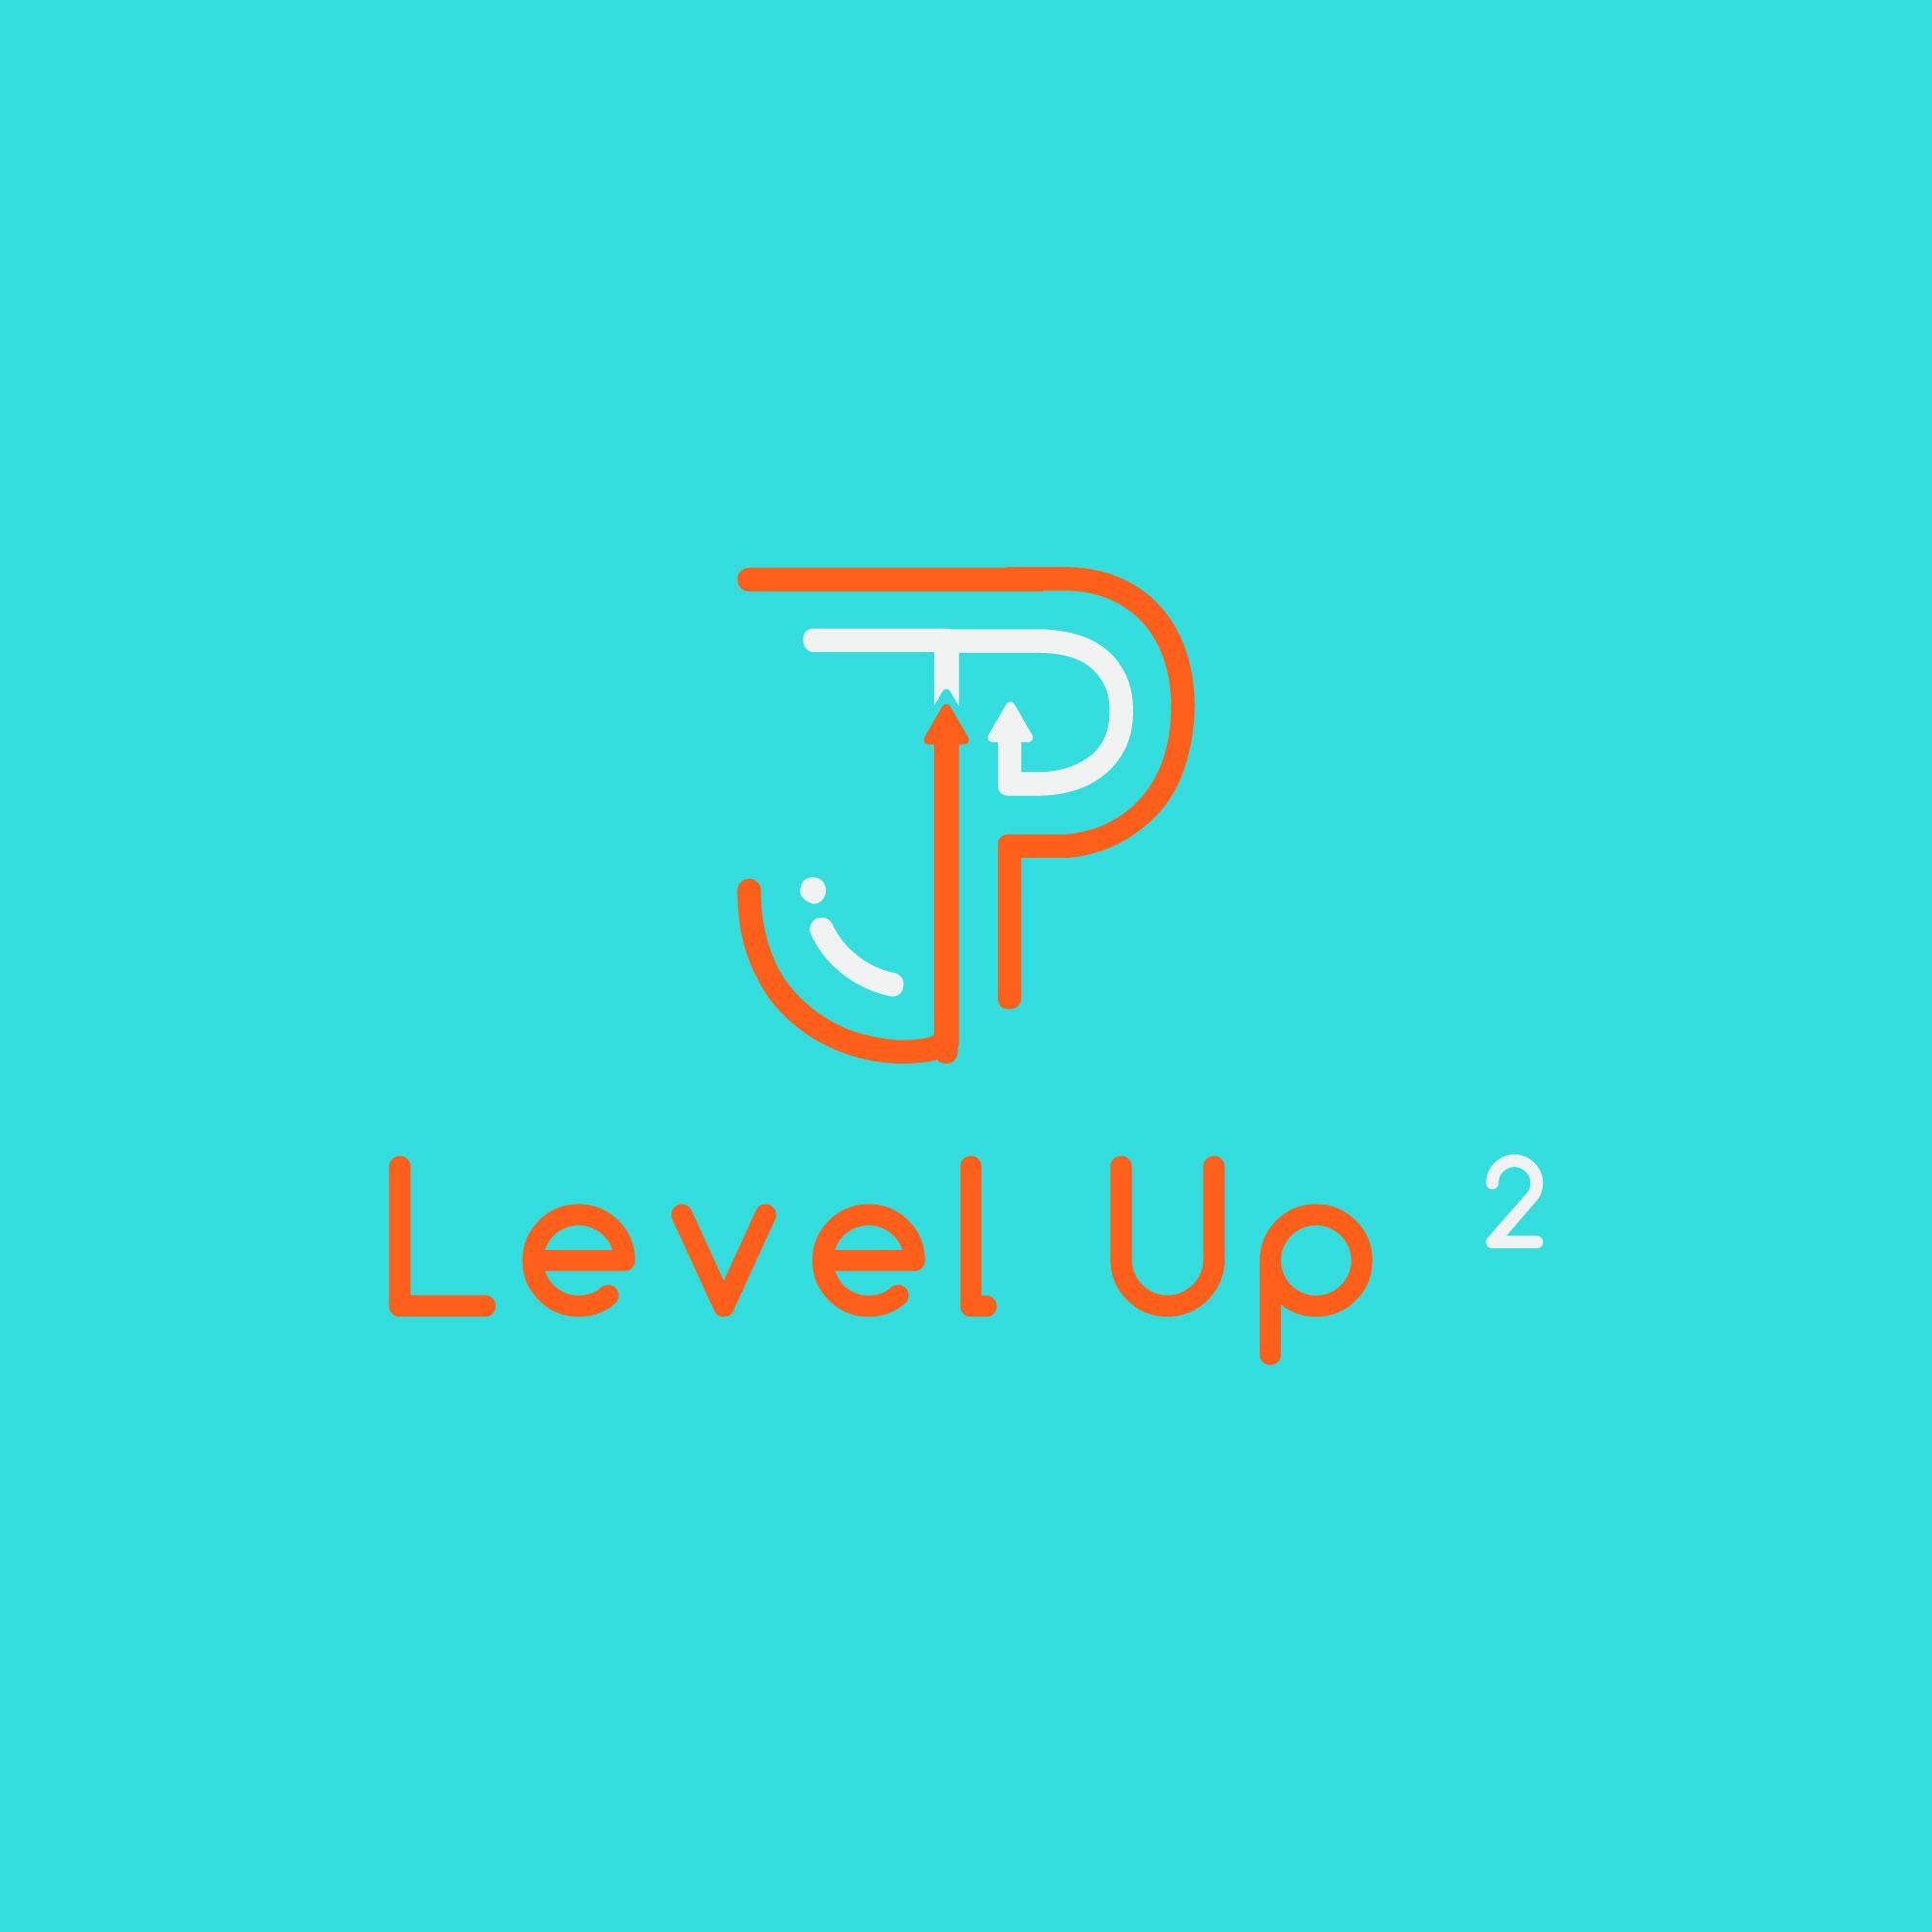 JP-Level-Up-2-LOGO-B1.jpg